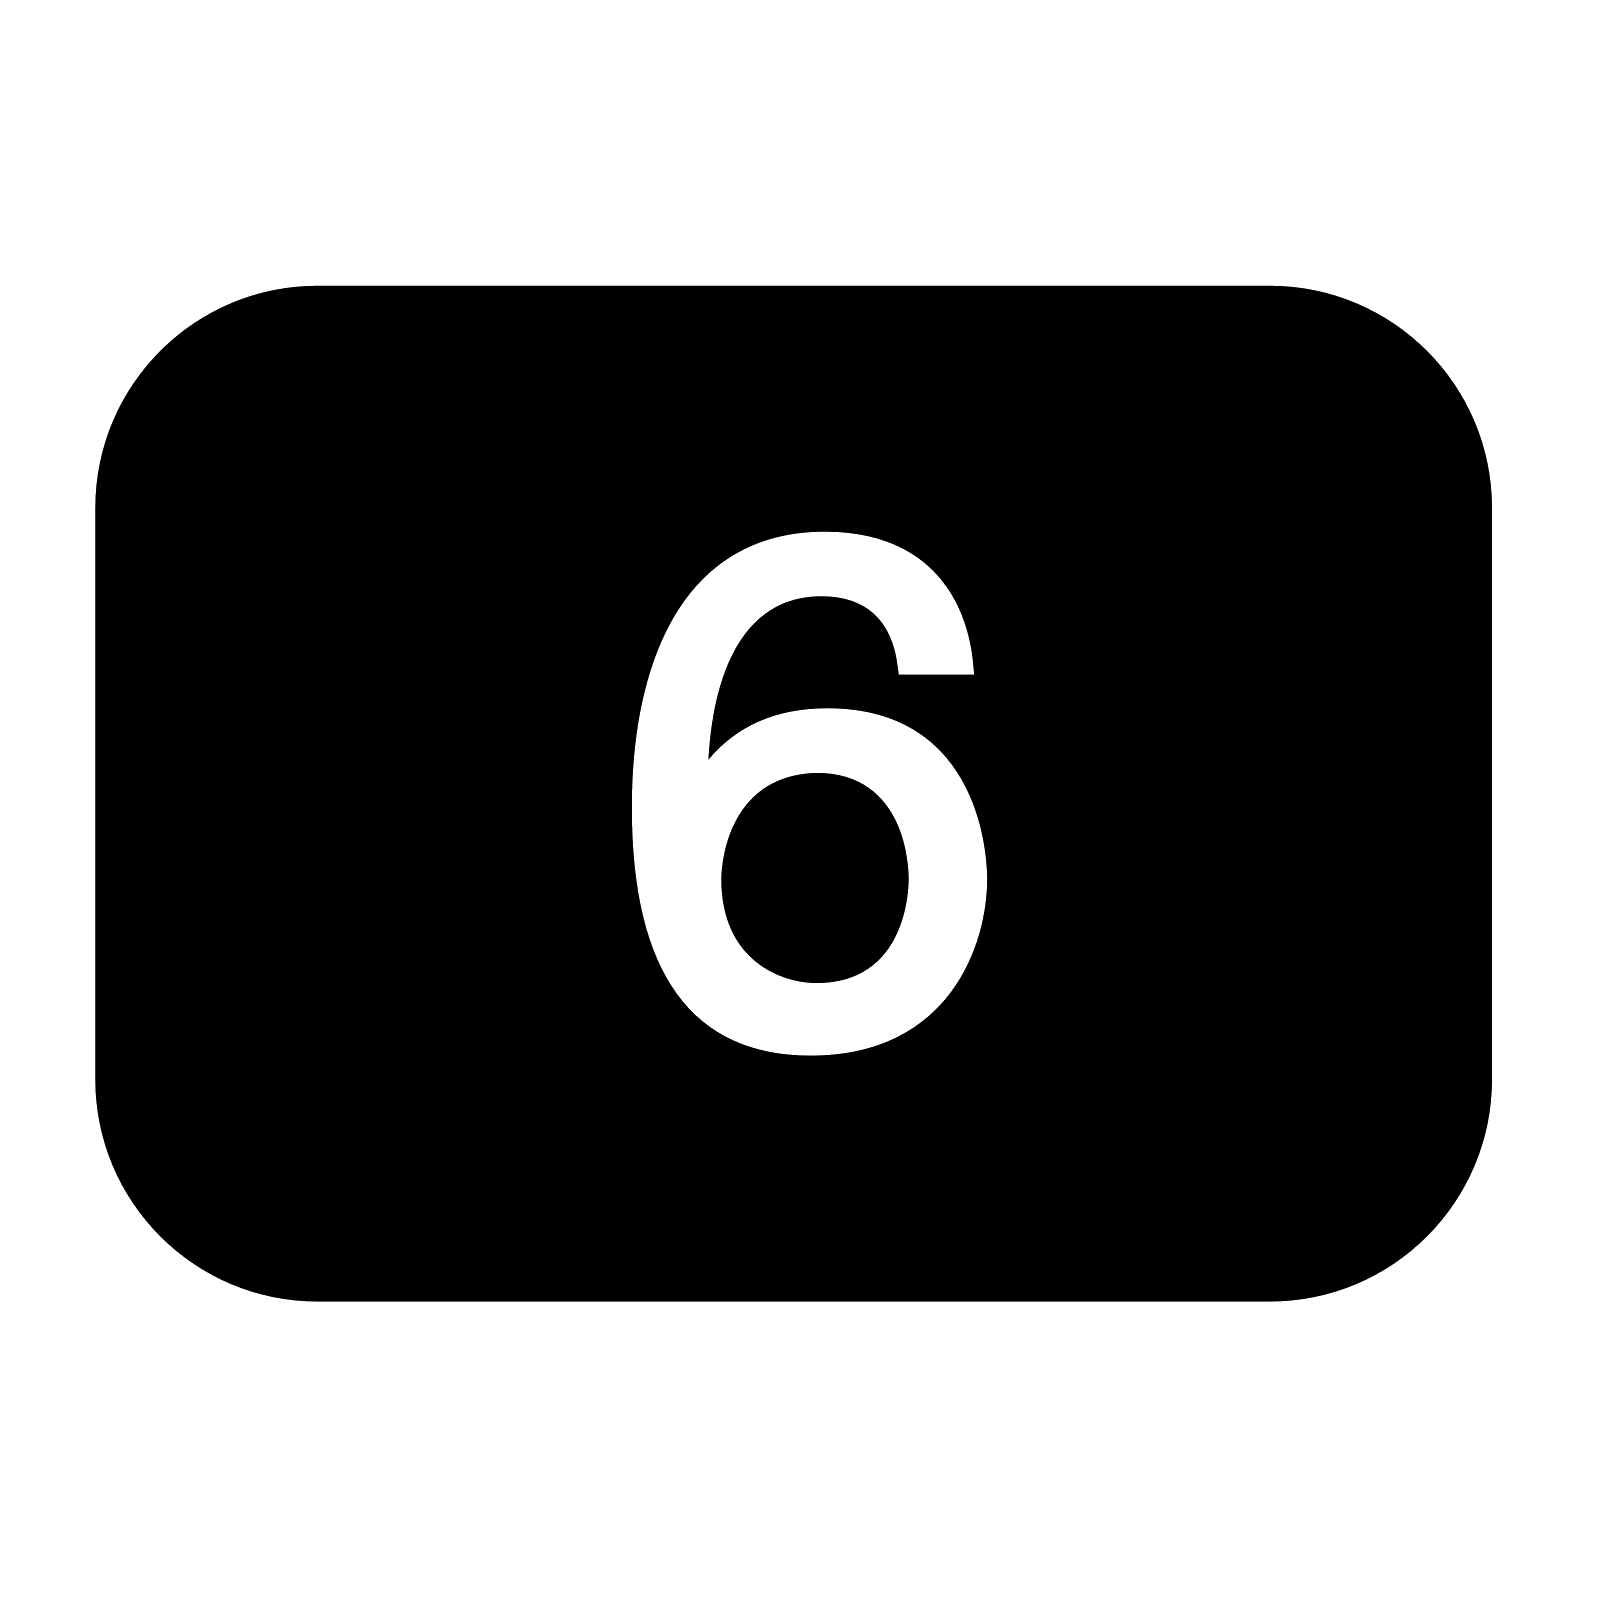 filled icon free. Hexagon clipart rectangular